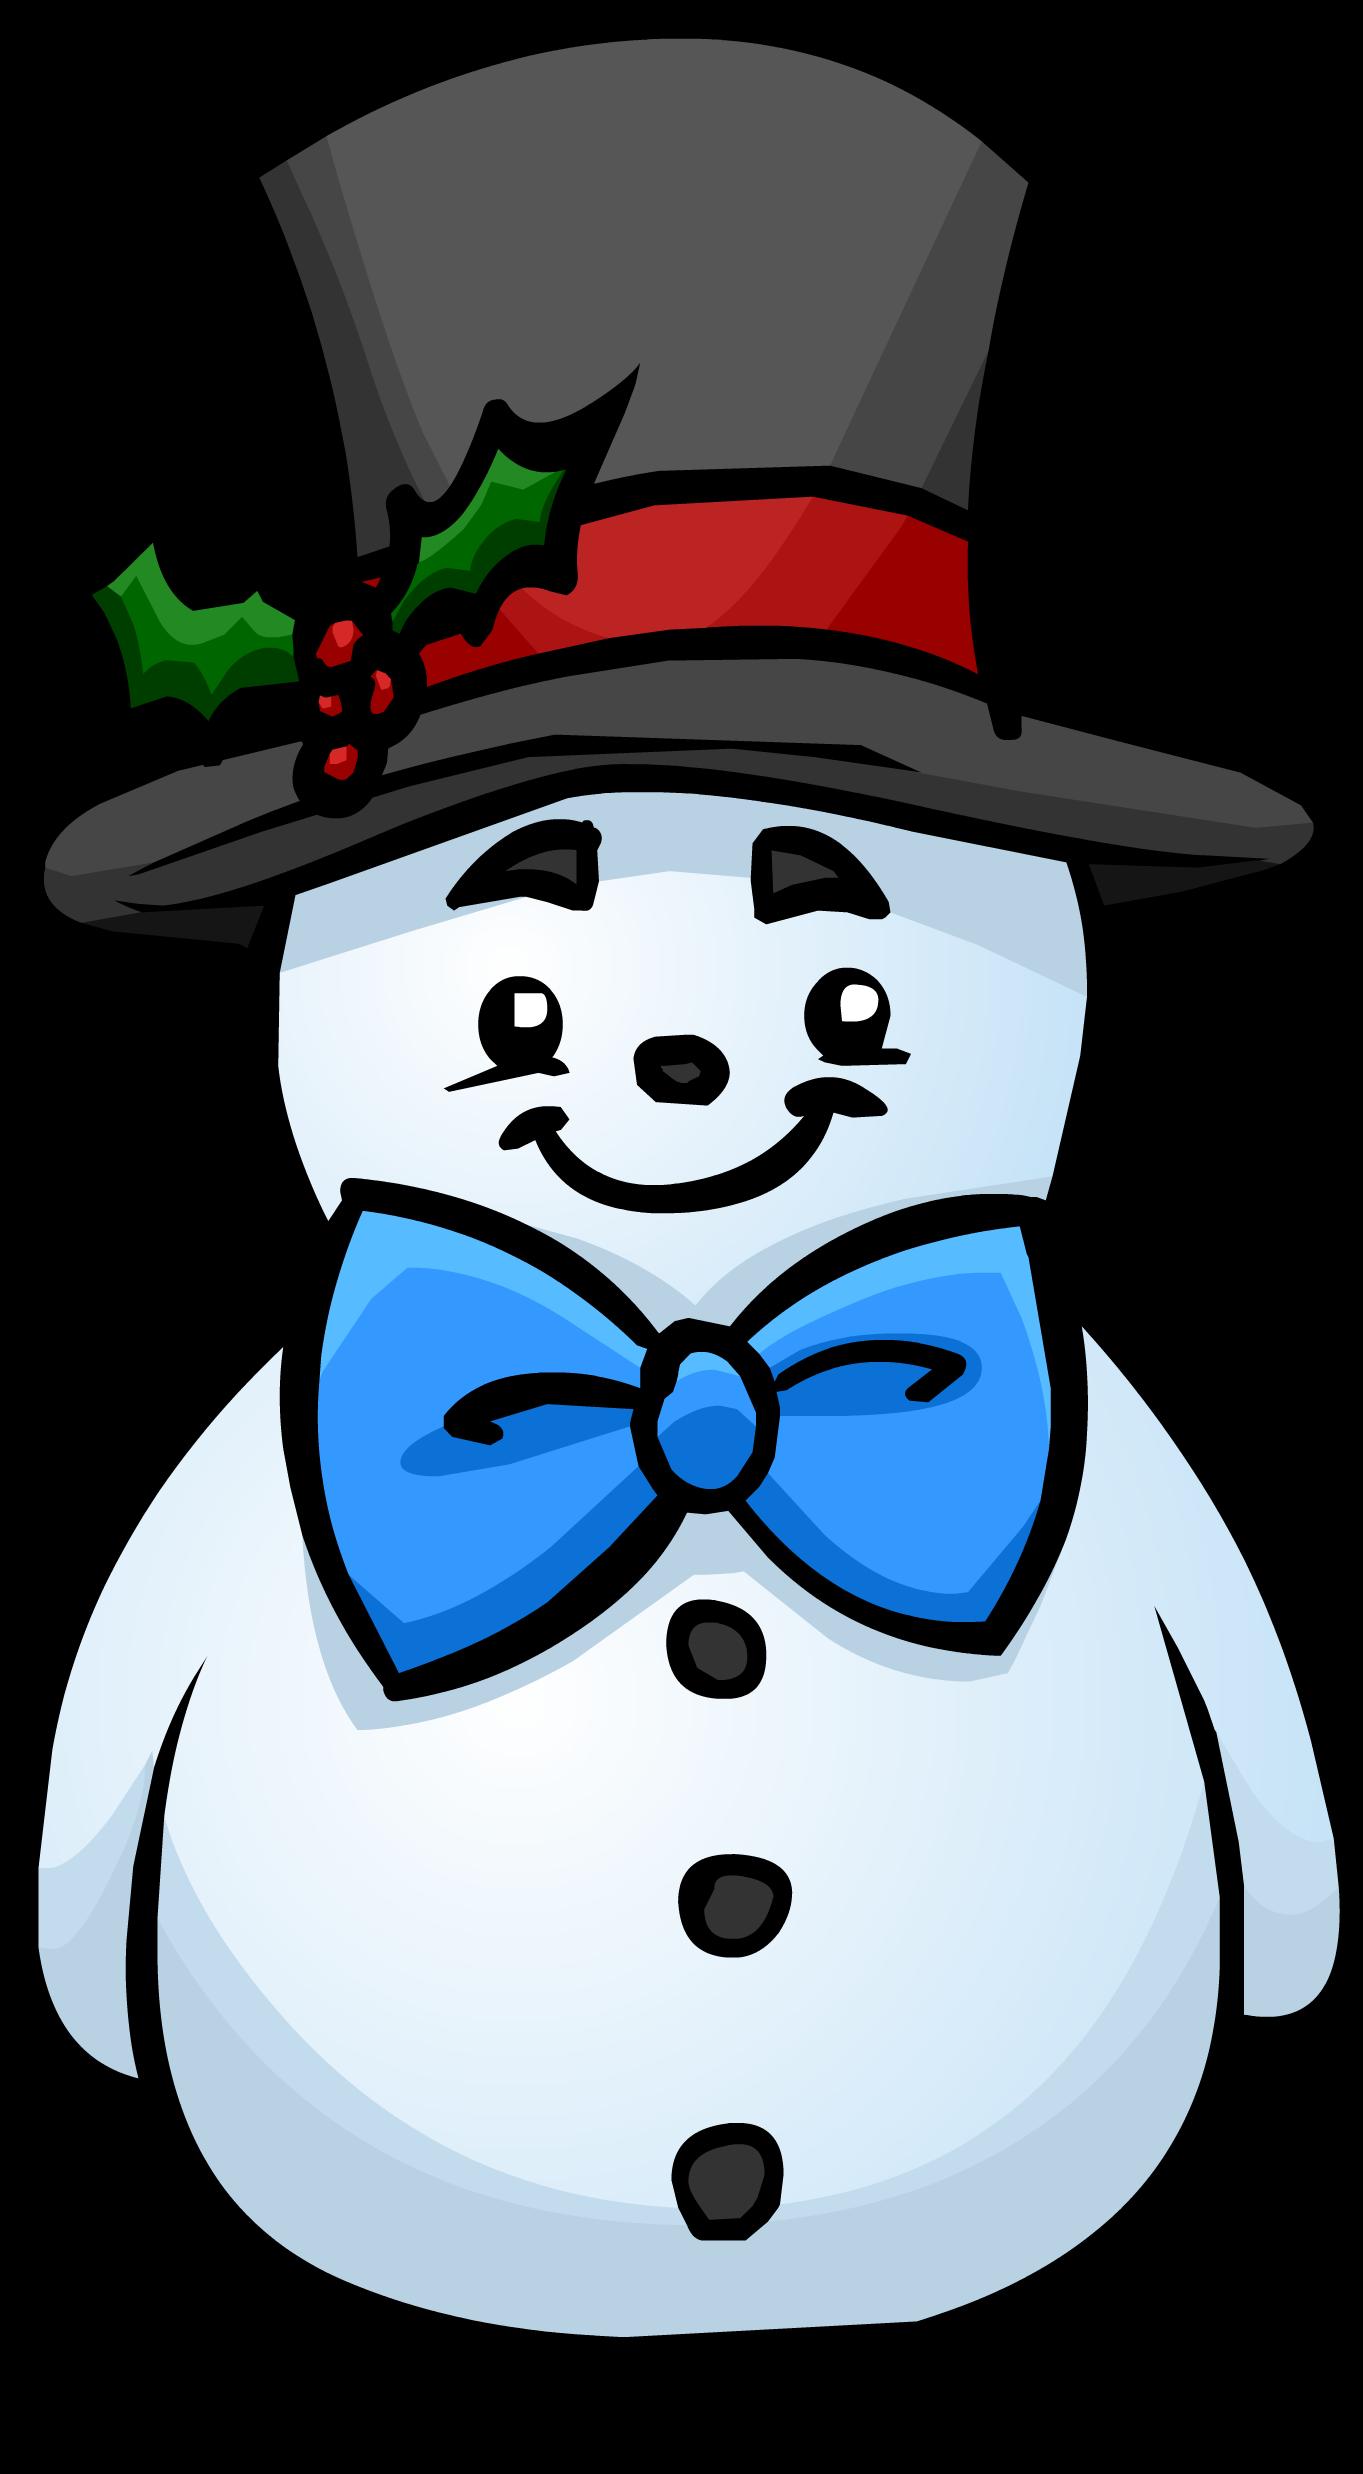 1363x2474 Top Hat Snowman Club Penguin Wiki Fandom Powered By Wikia